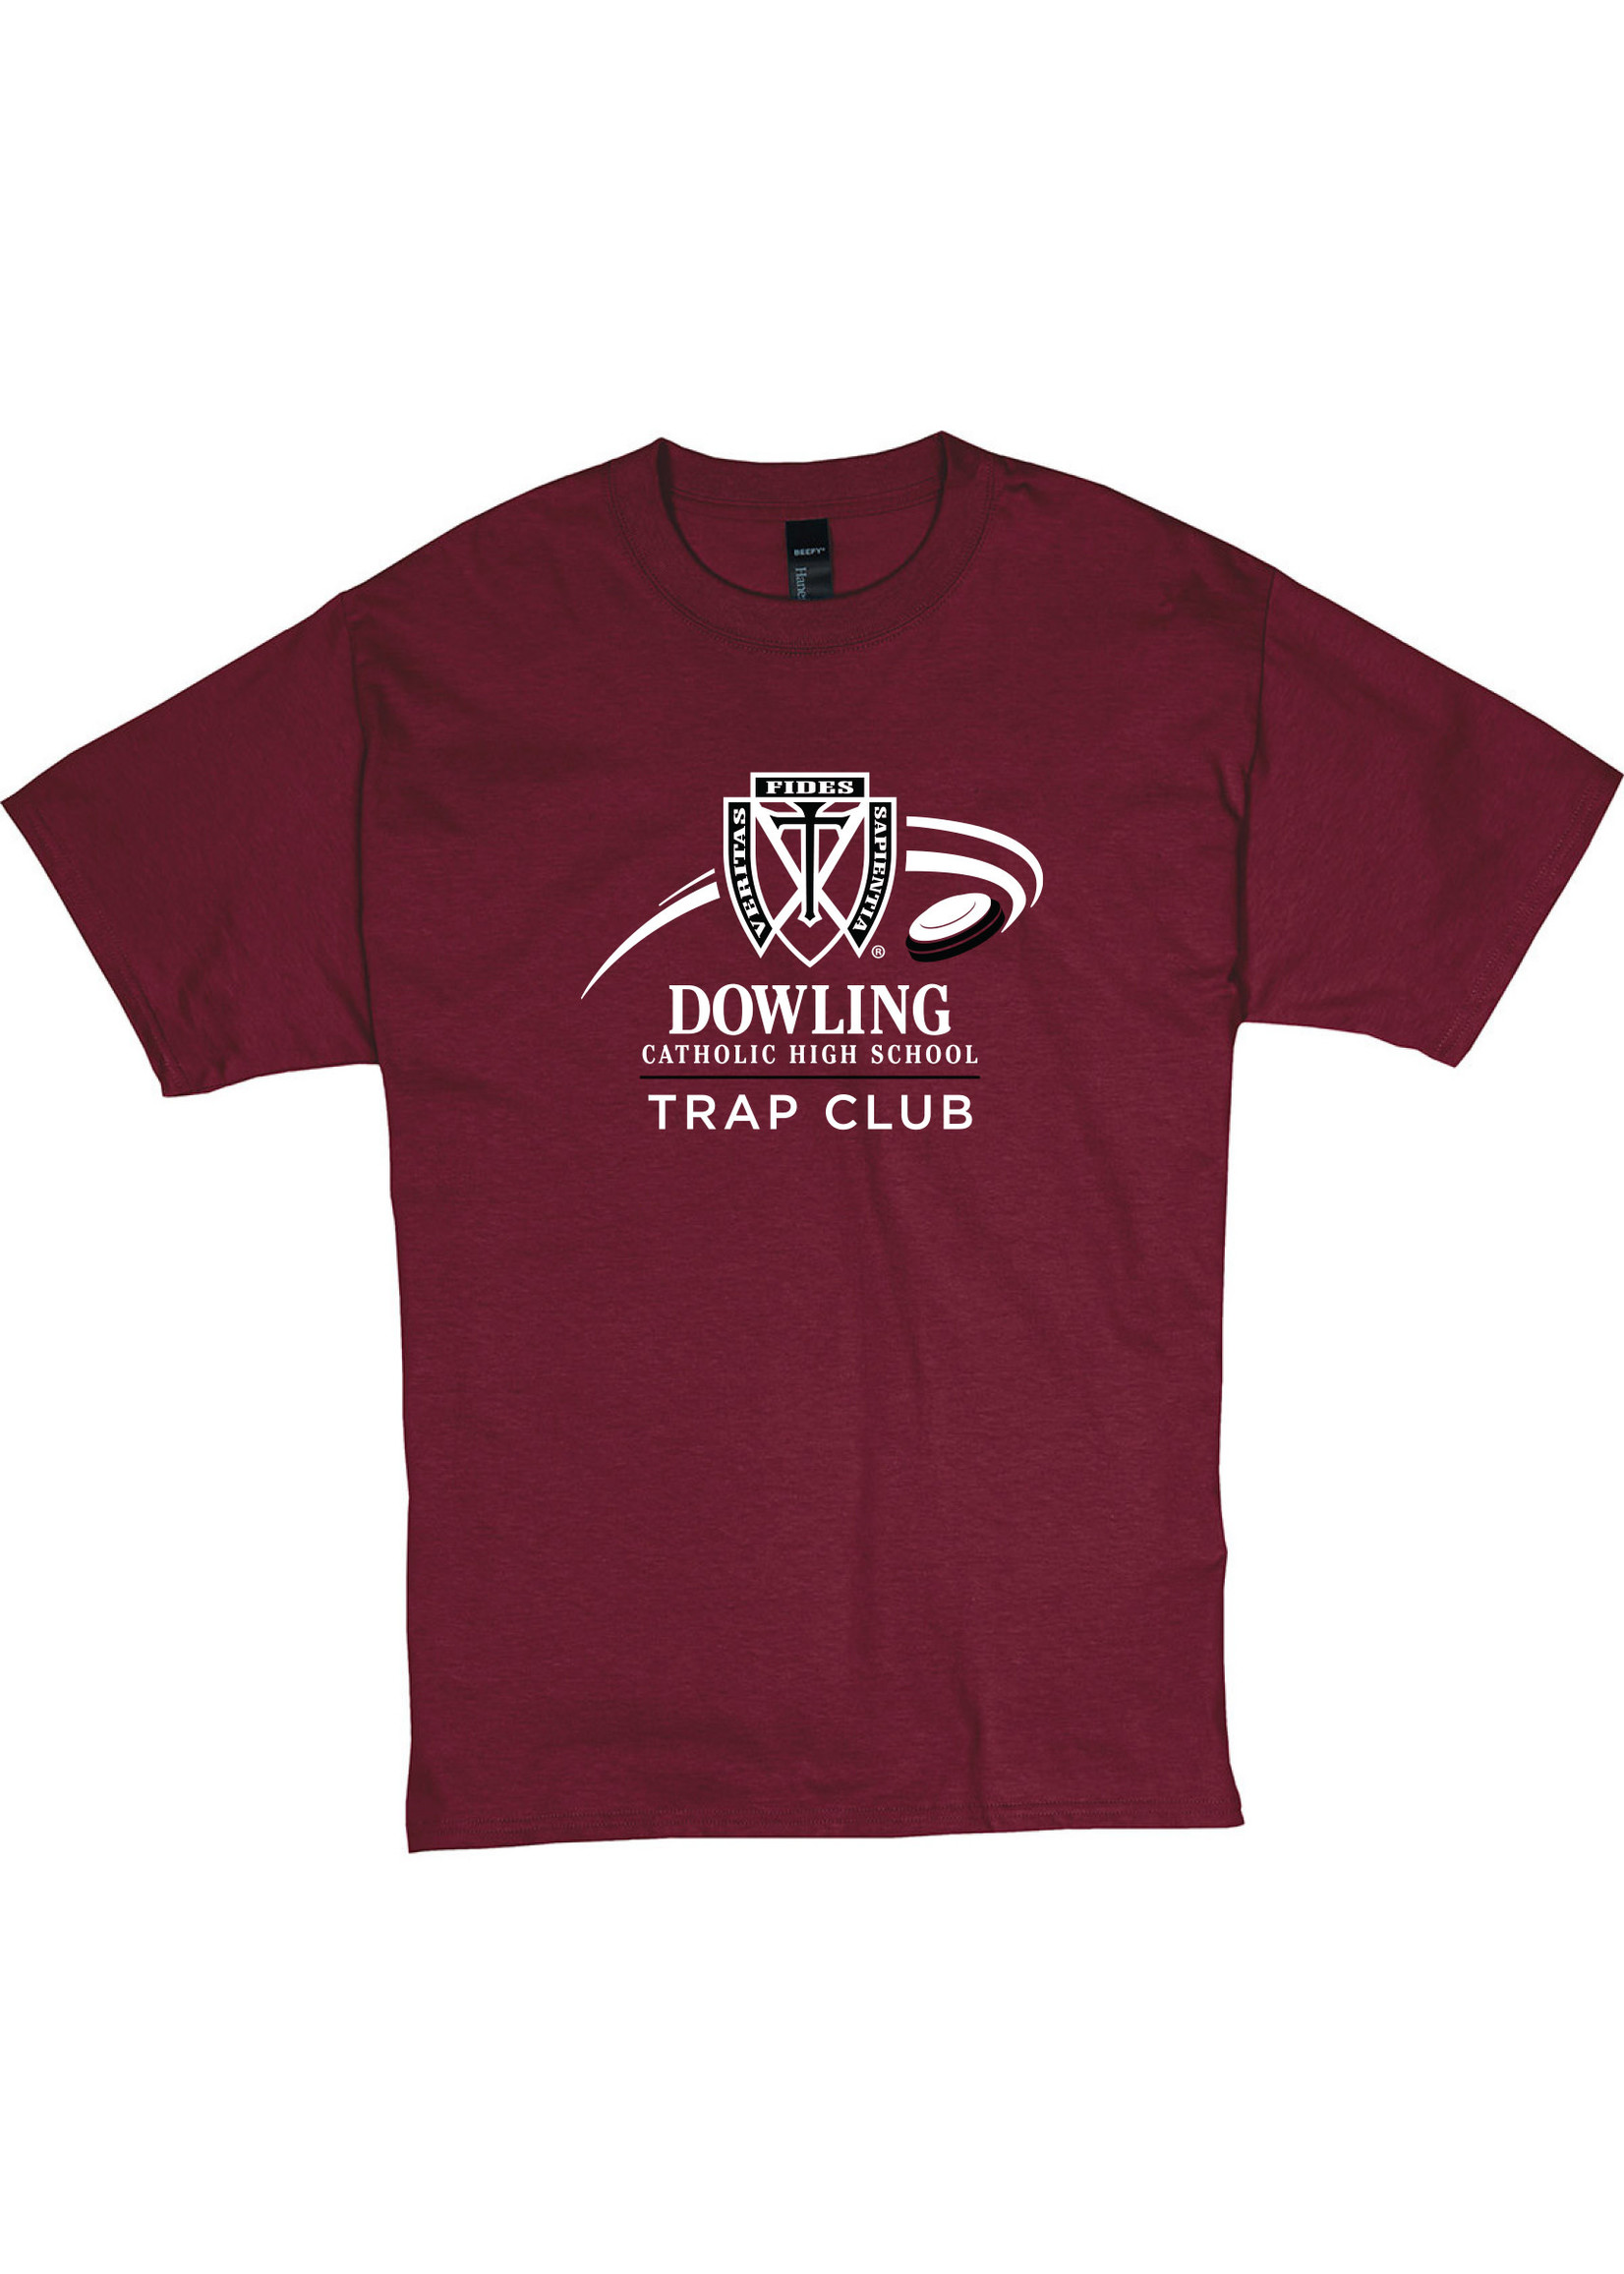 Hane's 2021 Trap Club Hanes Beefy-T - S/S